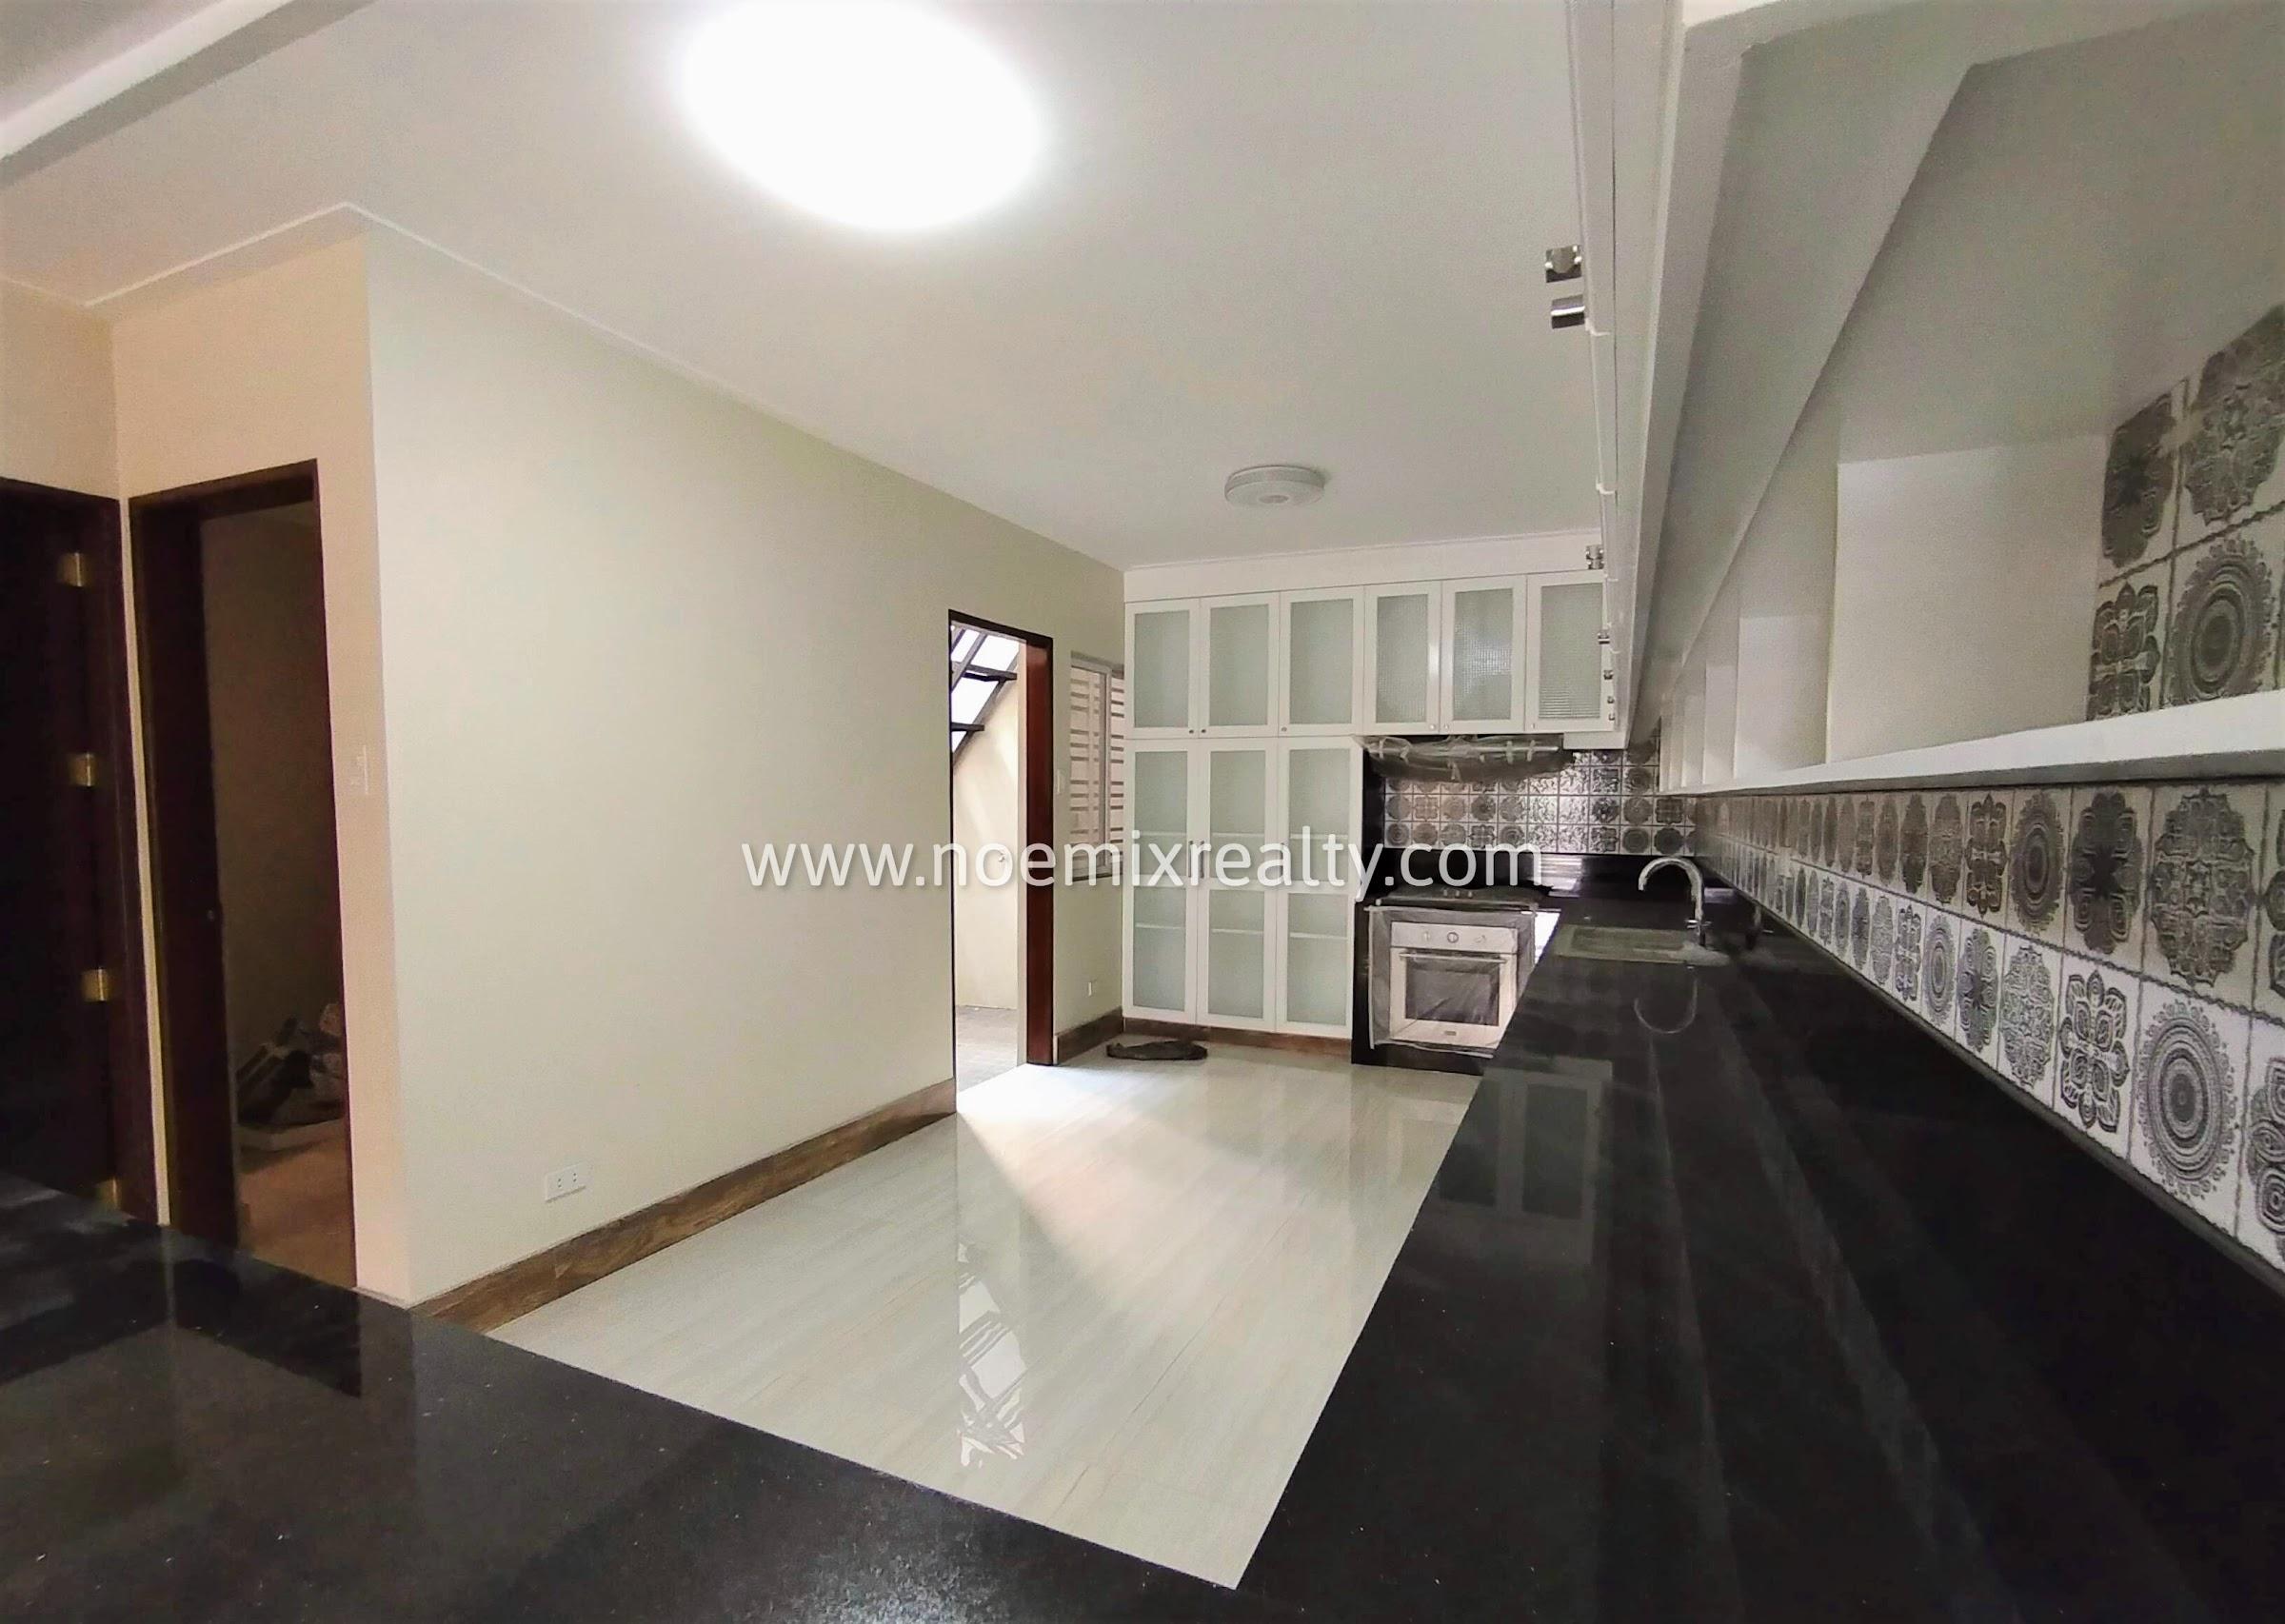 8 Bedroom Townhouse in Tandang Sora, Mindanao Avenue, Quezon City kitchen